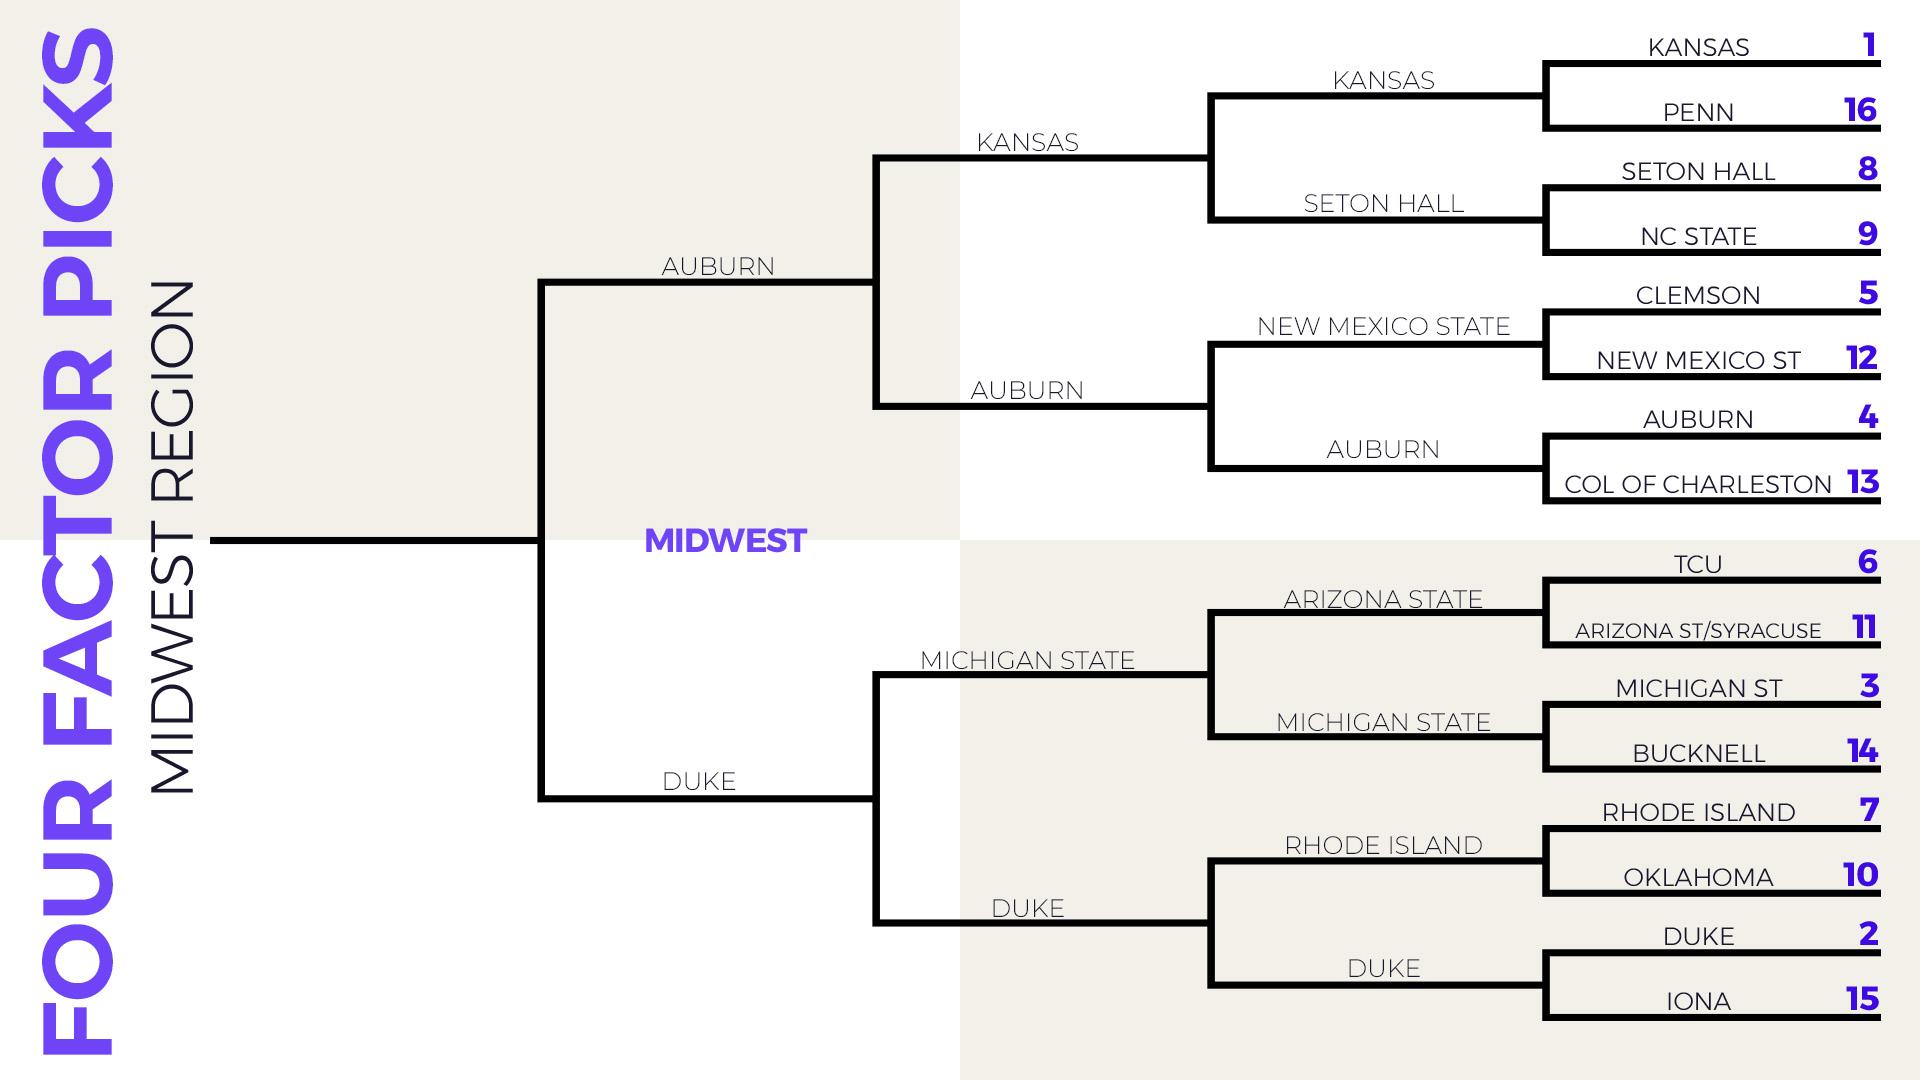 4FS Midwest